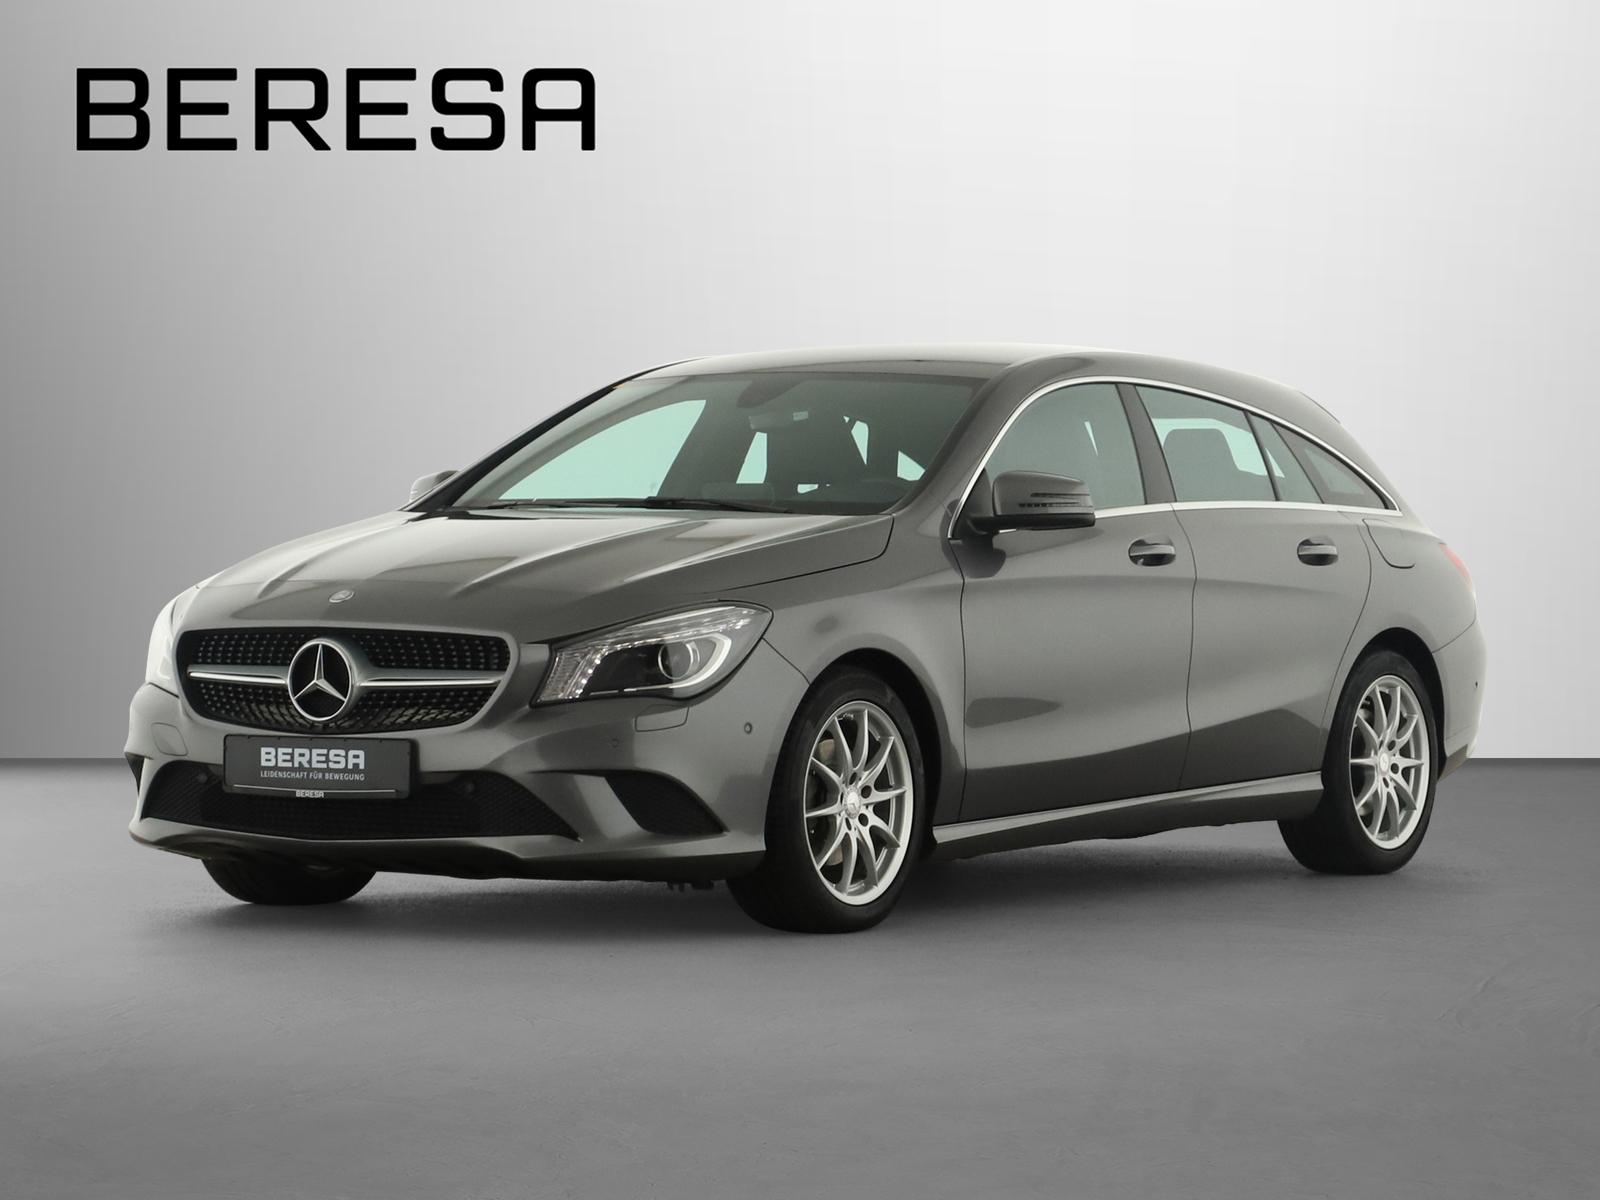 Mercedes-Benz CLA 200 CDI SB Urban *AHK* Xenon Sitzhzg Navi, Jahr 2015, Diesel